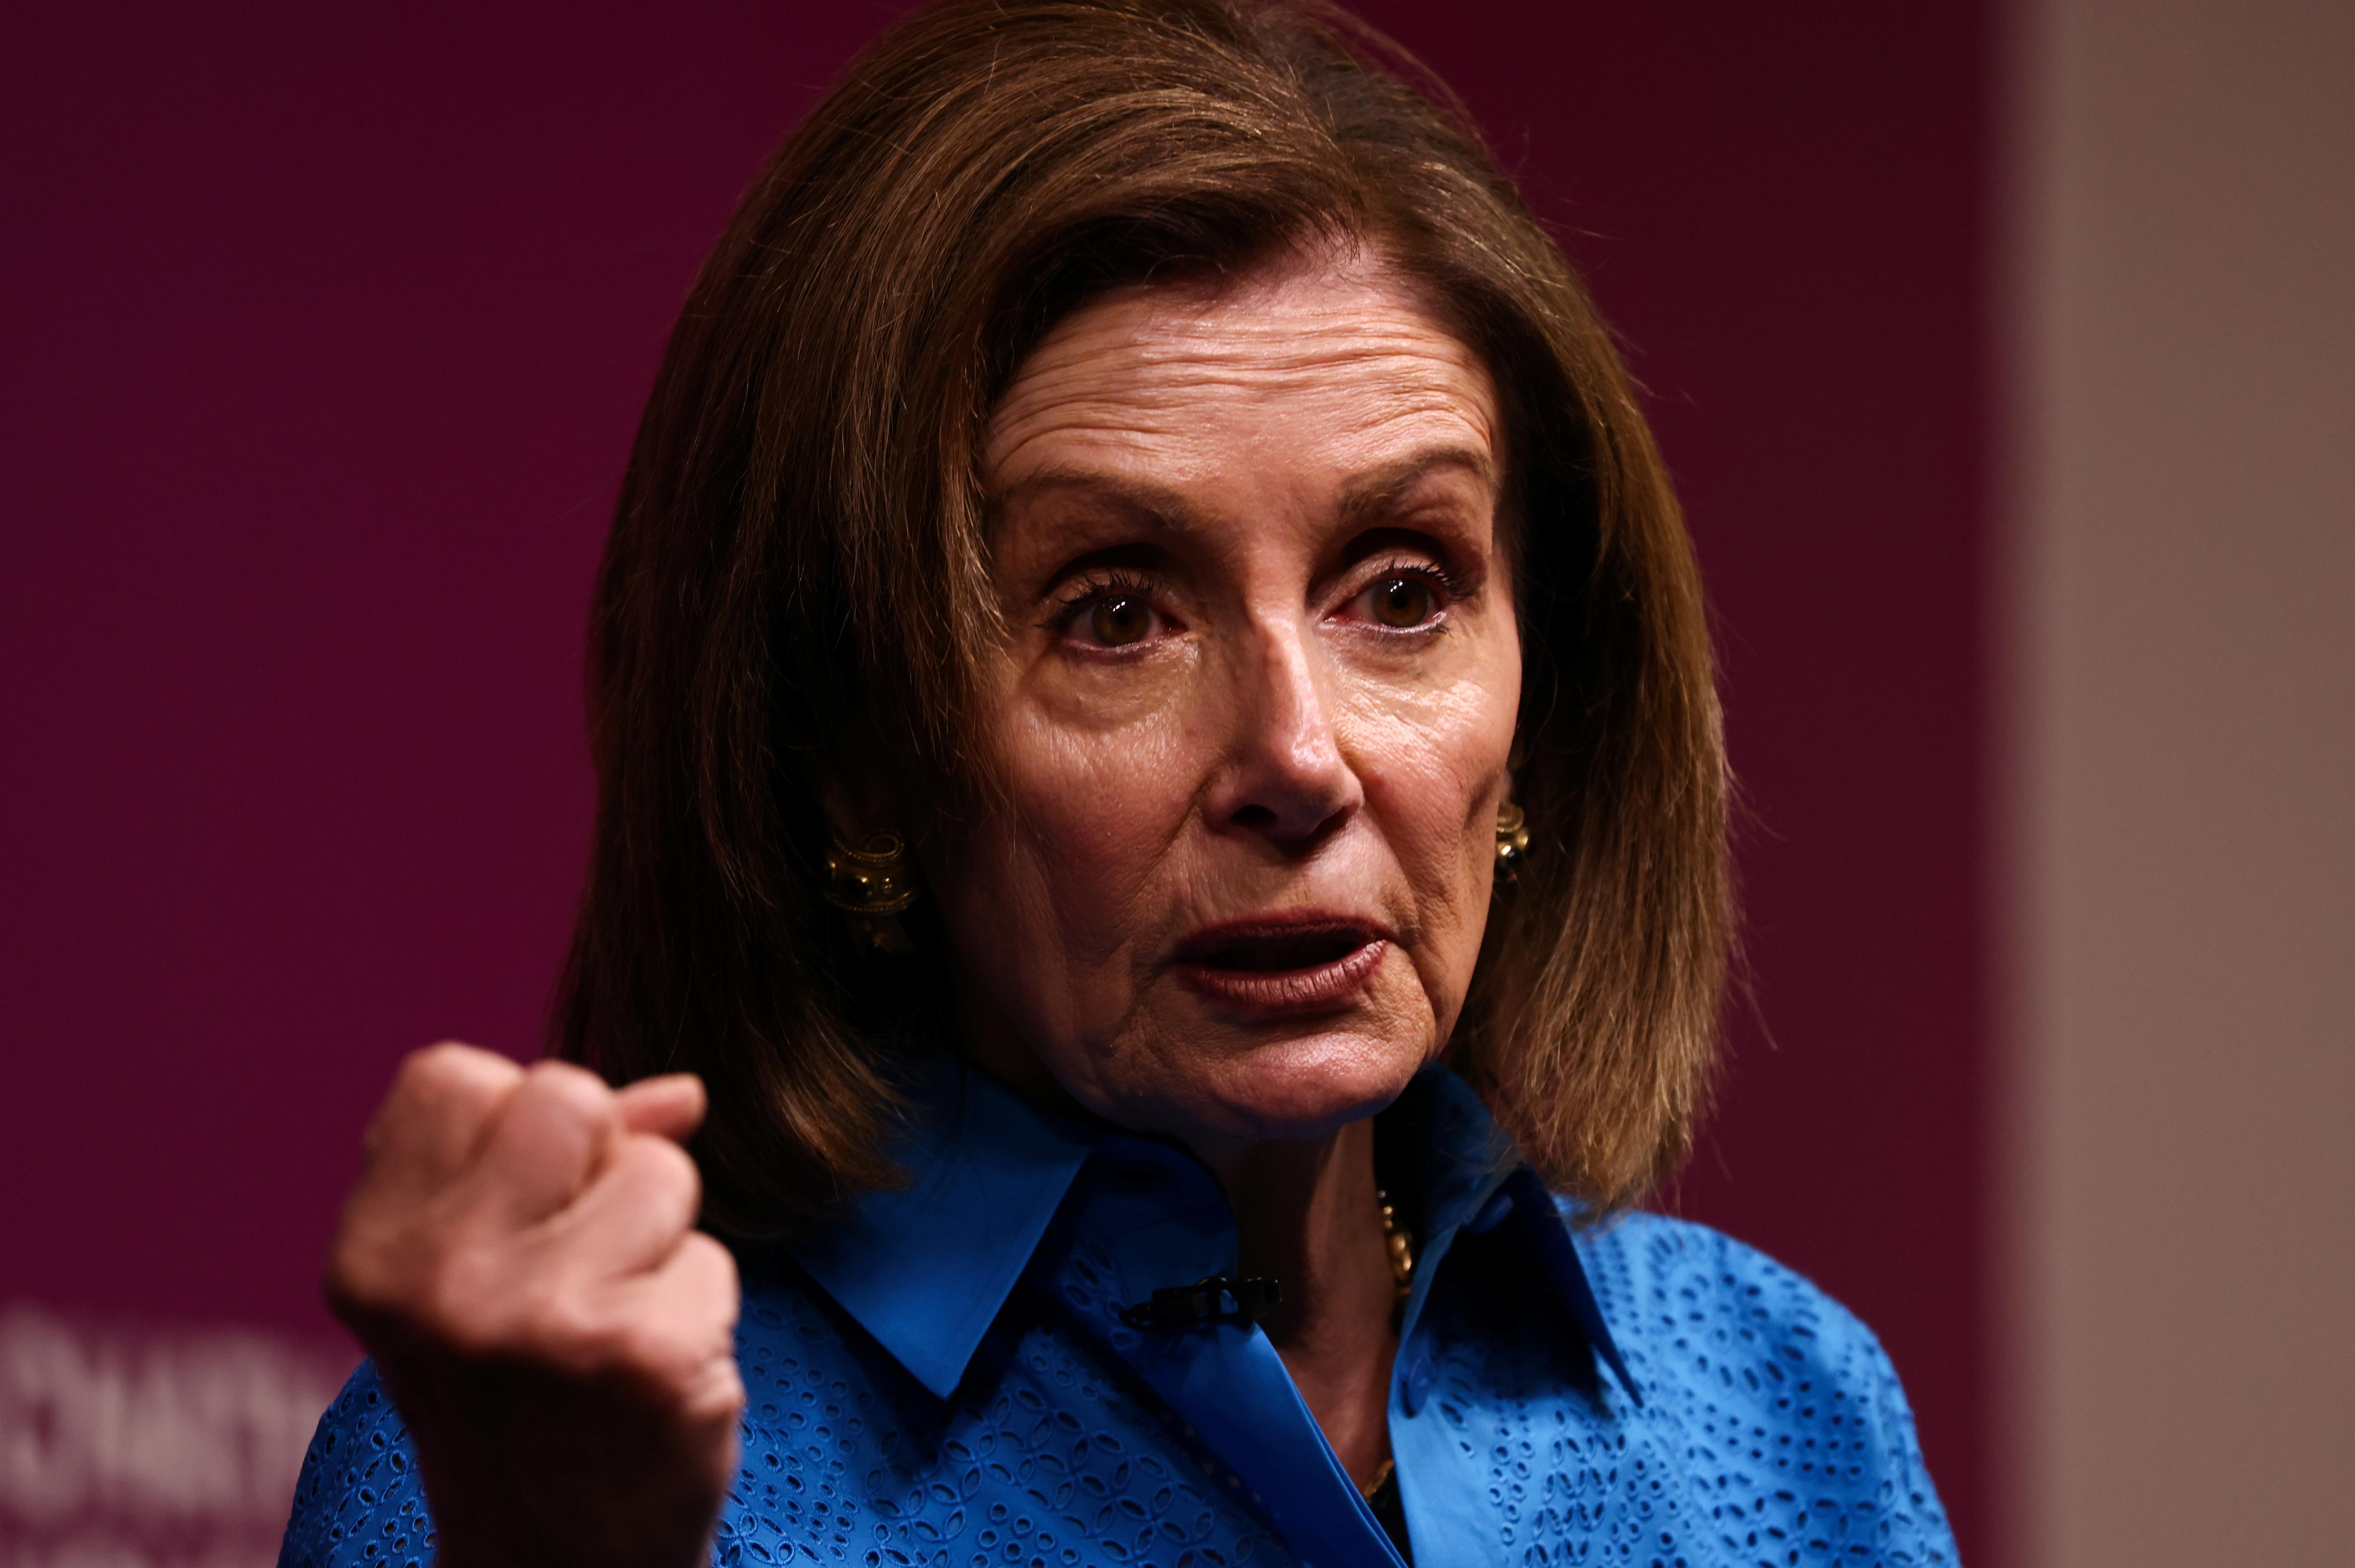 U.S. House Speaker Nancy Pelosi speaks on